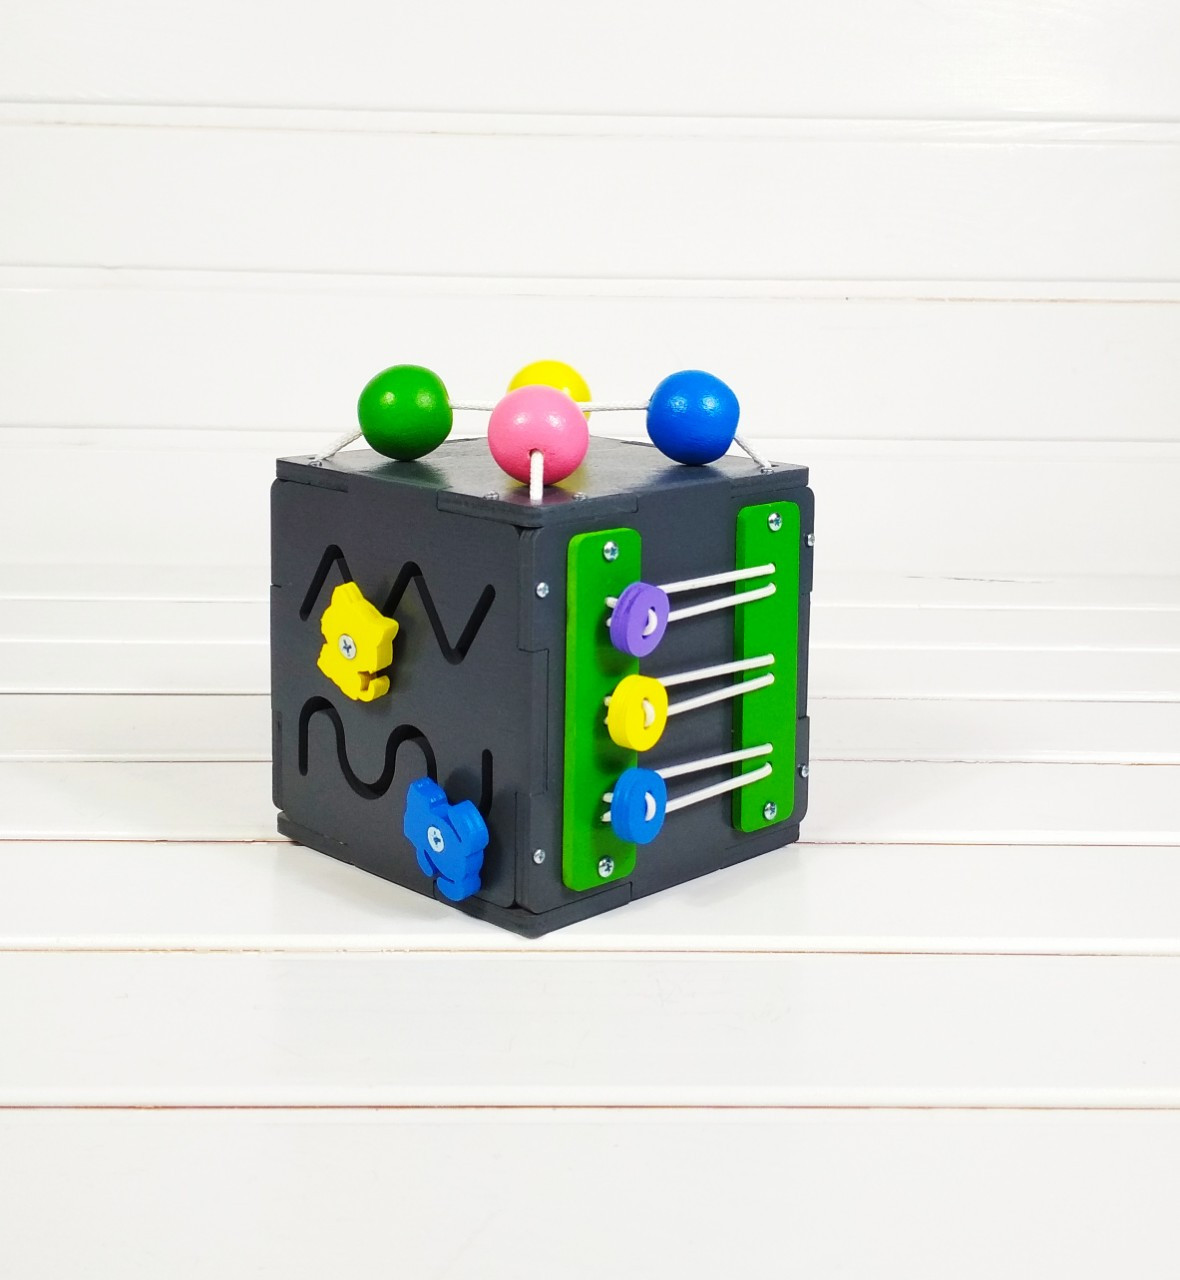 Развивающая игрушка Мини бизикуб Mini Busy Cube Tornado Черная